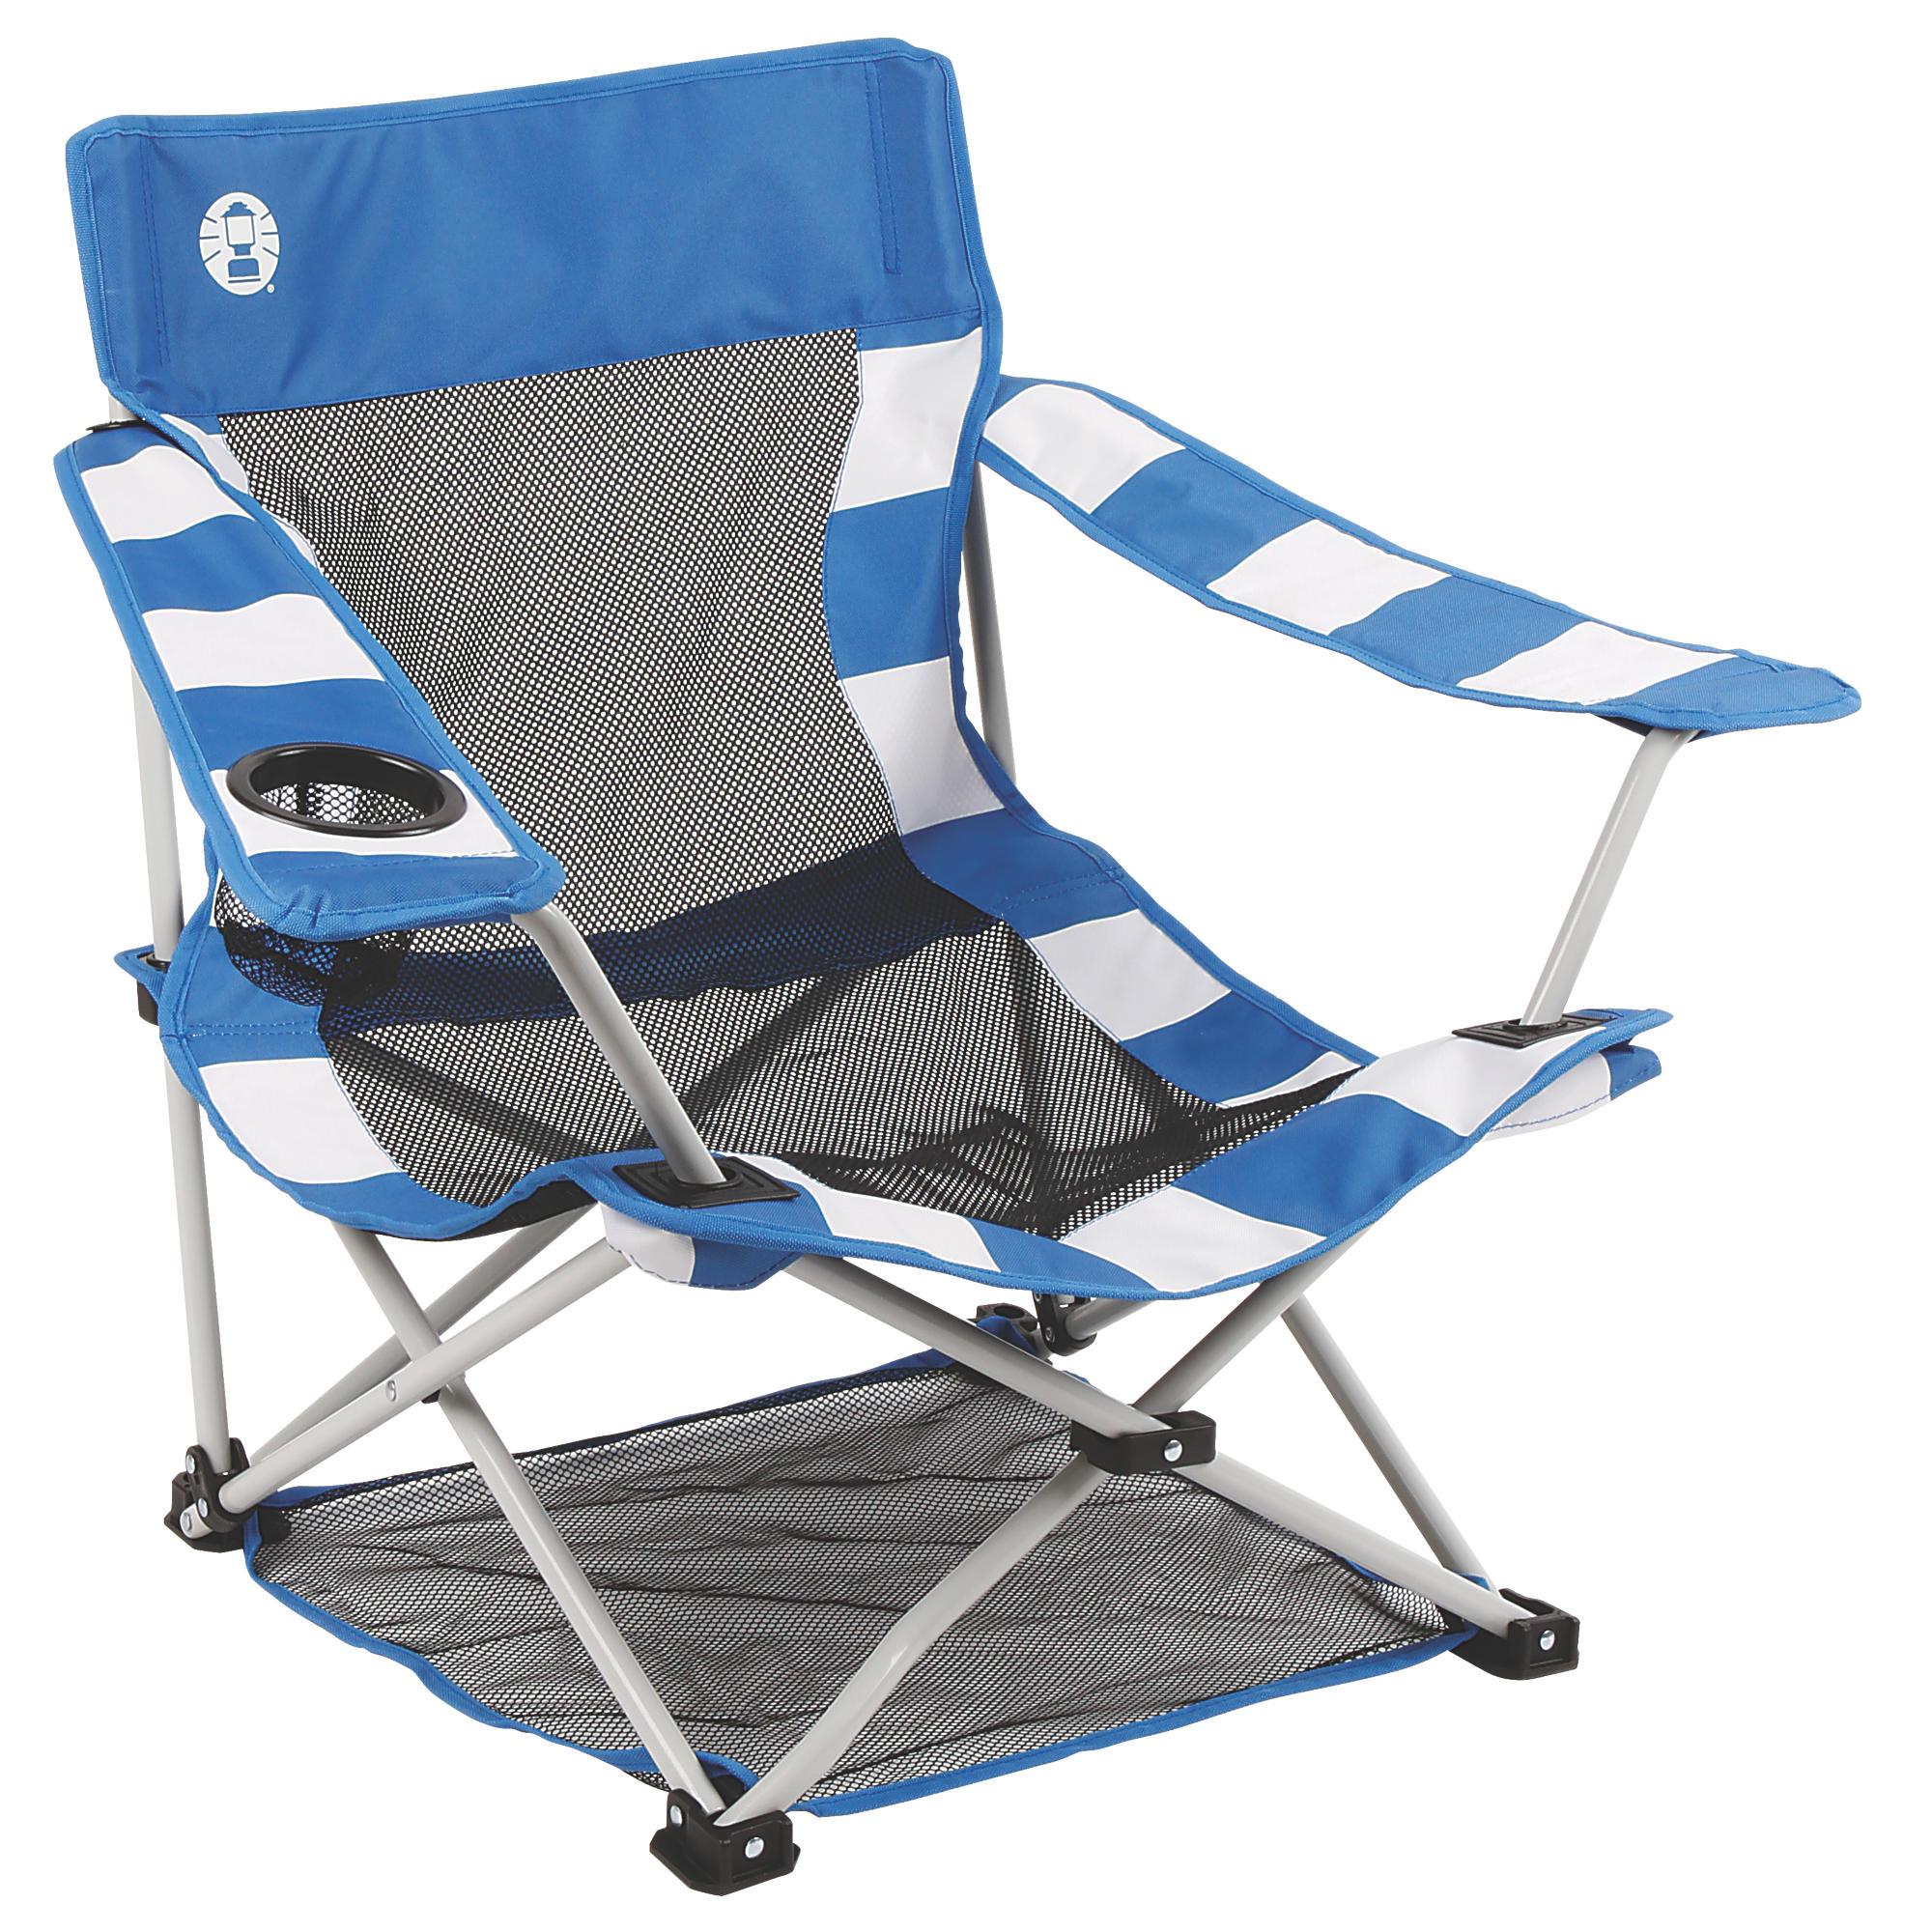 Utopia Breeze Quad Chair